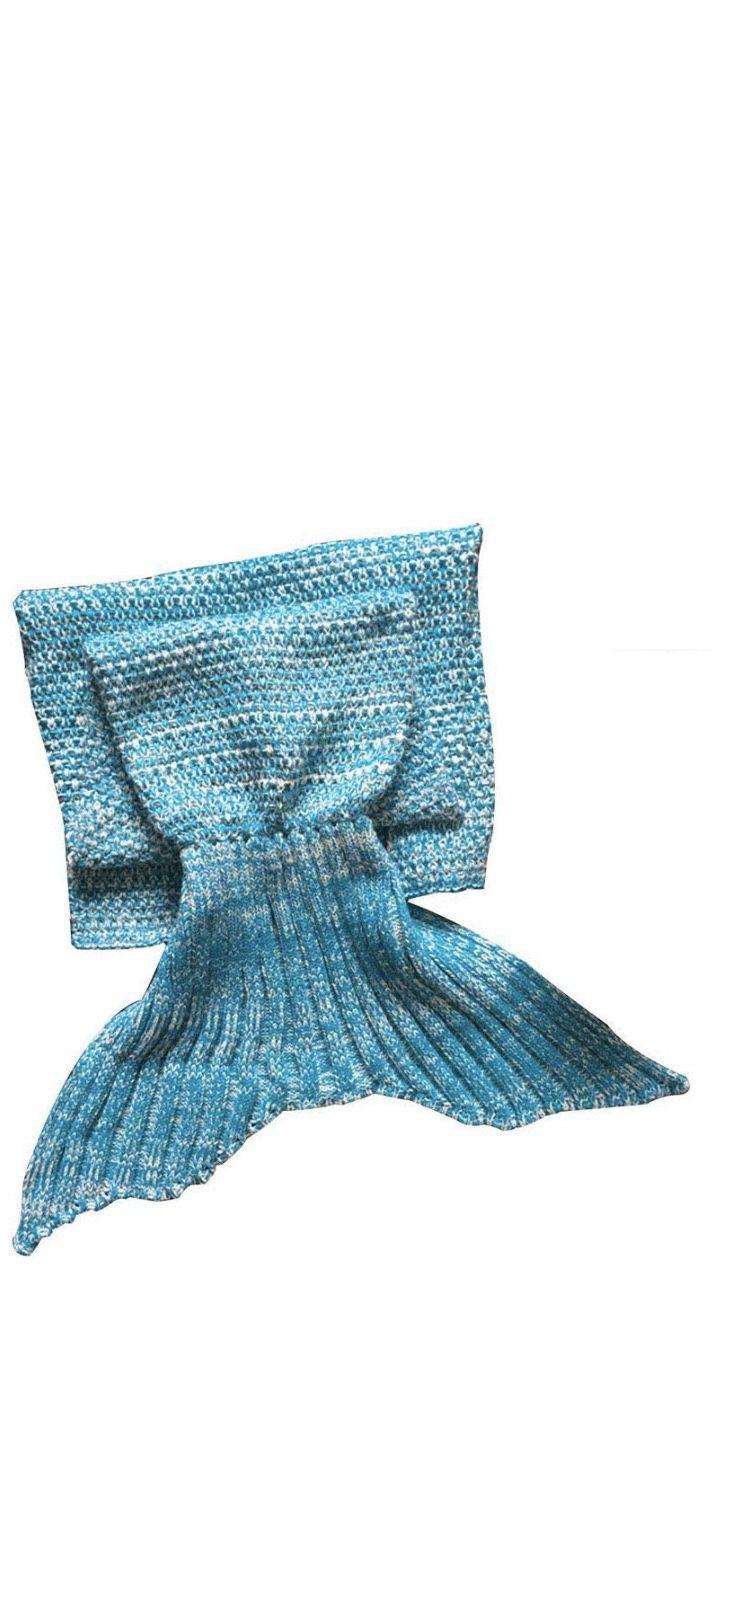 Brand new Mermaid Tail Blanket for Adult, Light Blue